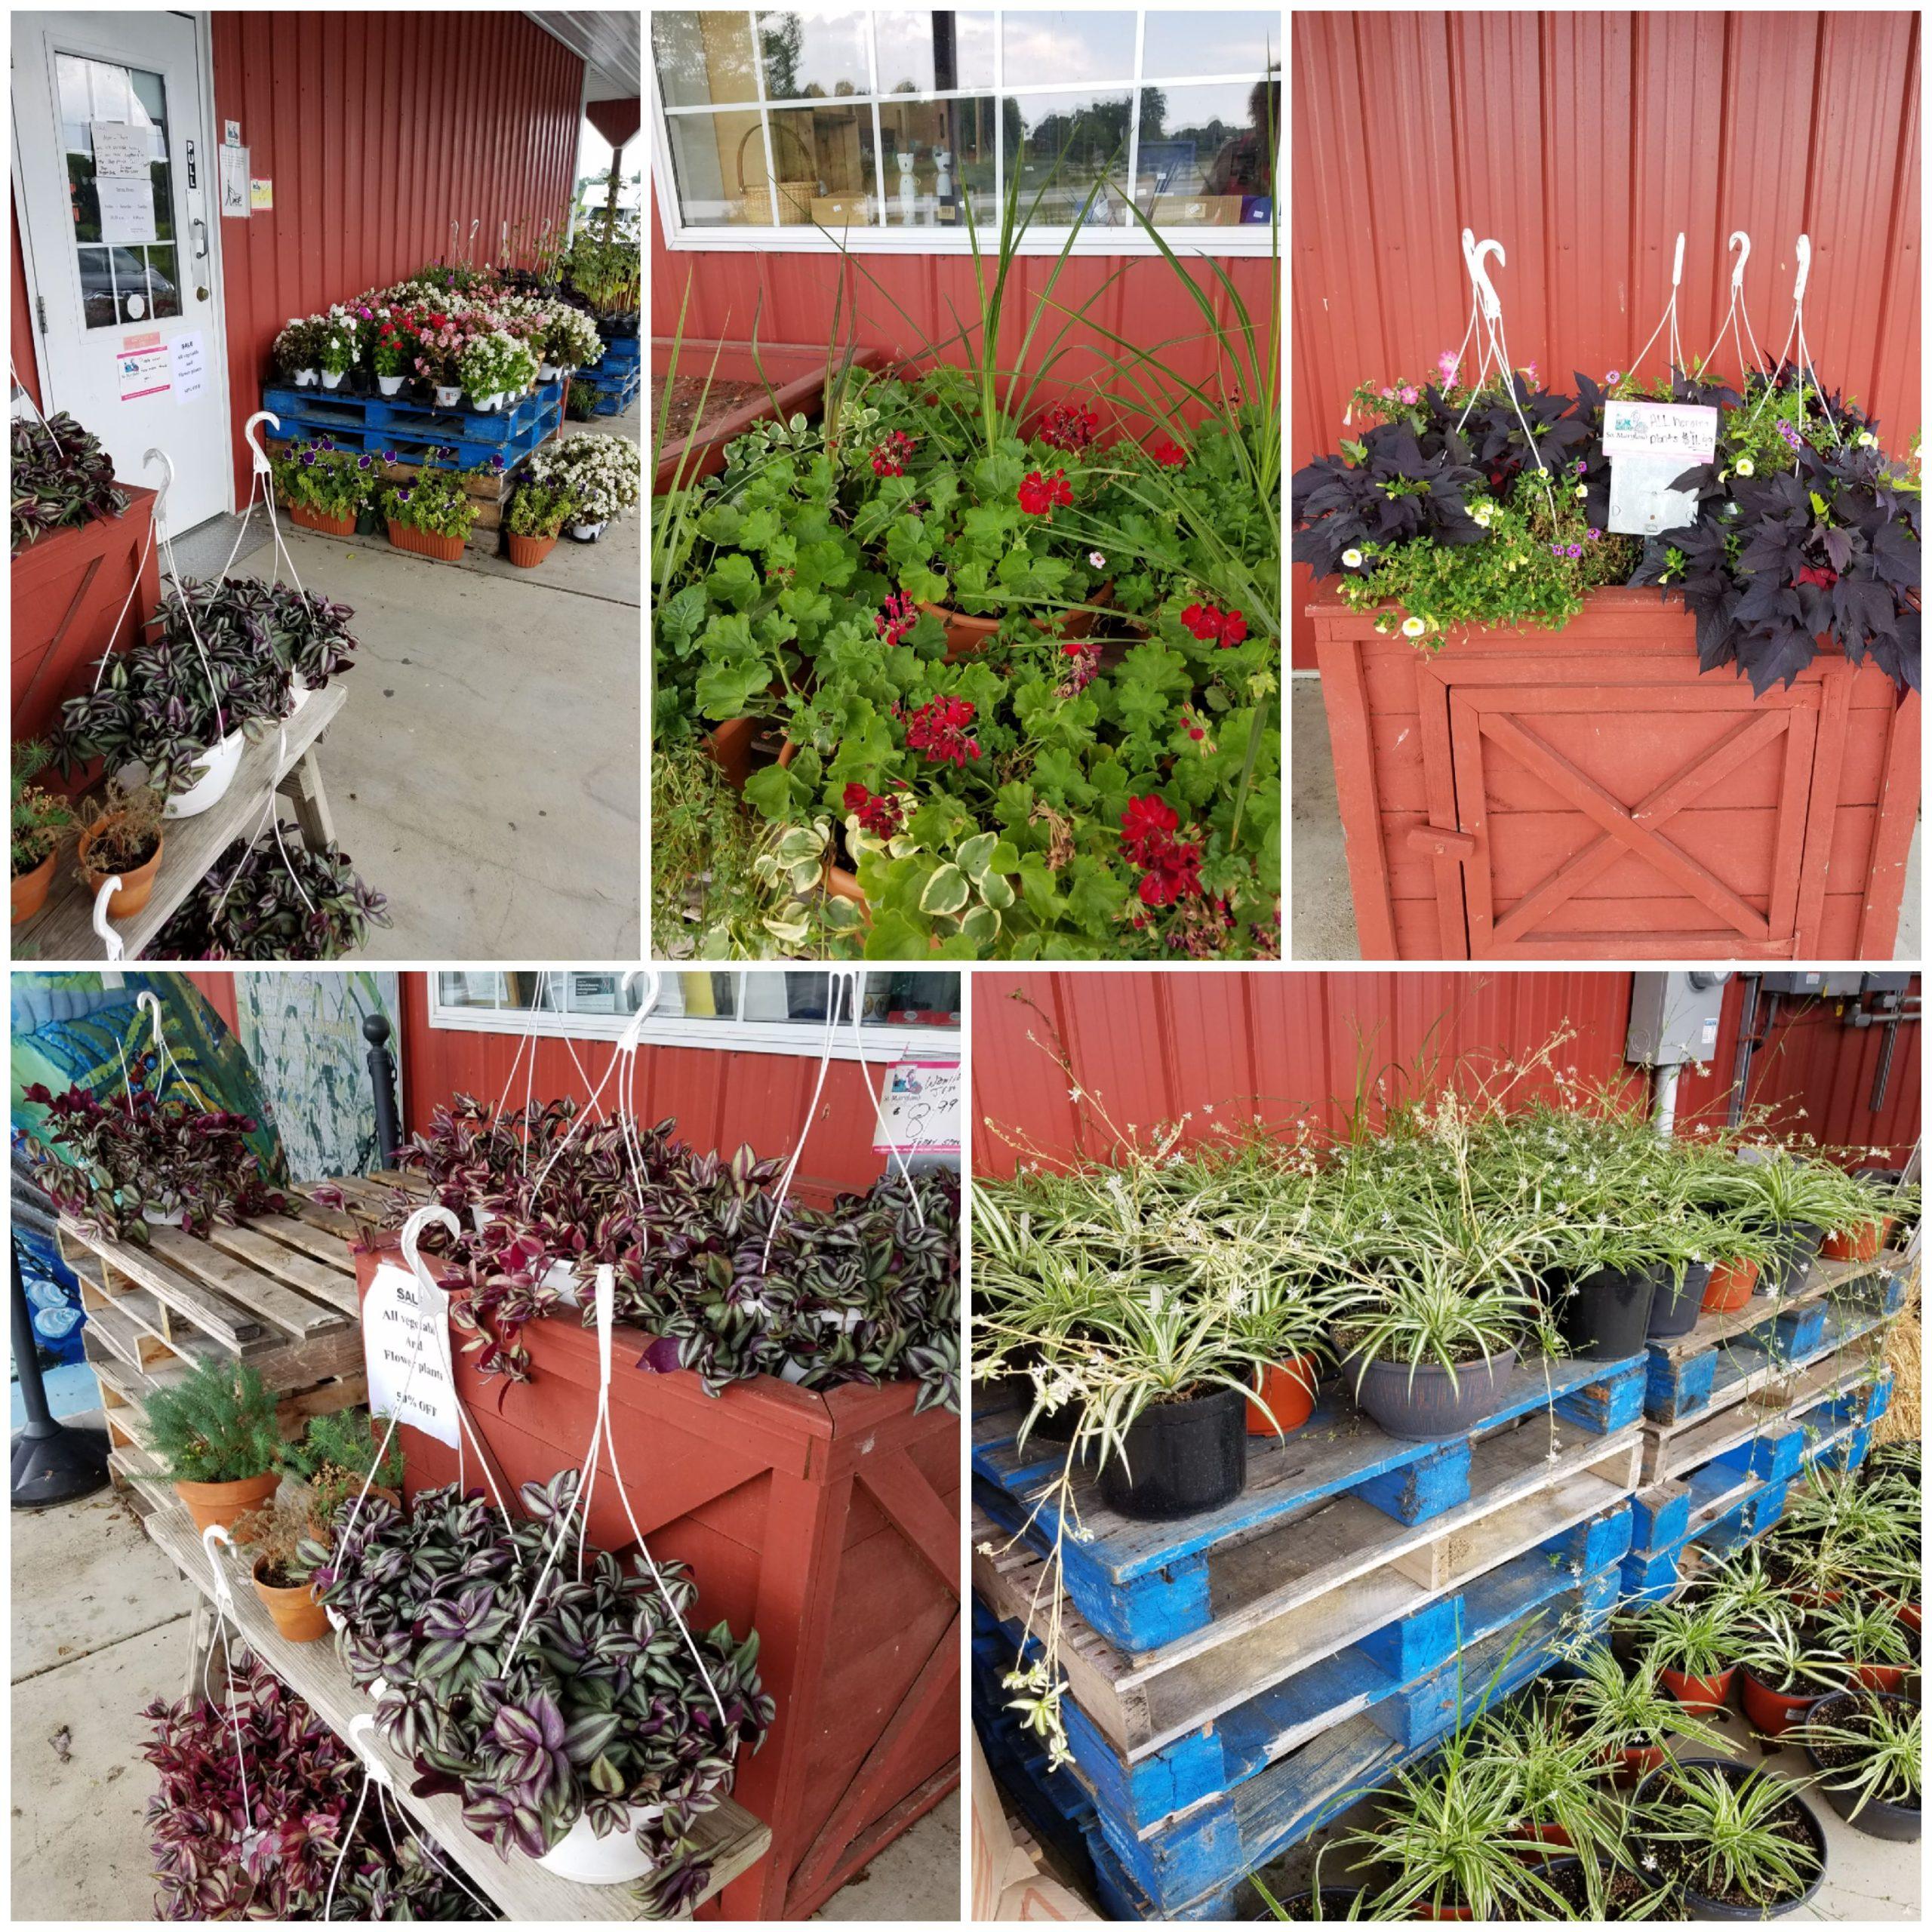 Plant sale! 50% off all flowers & vegetable plants